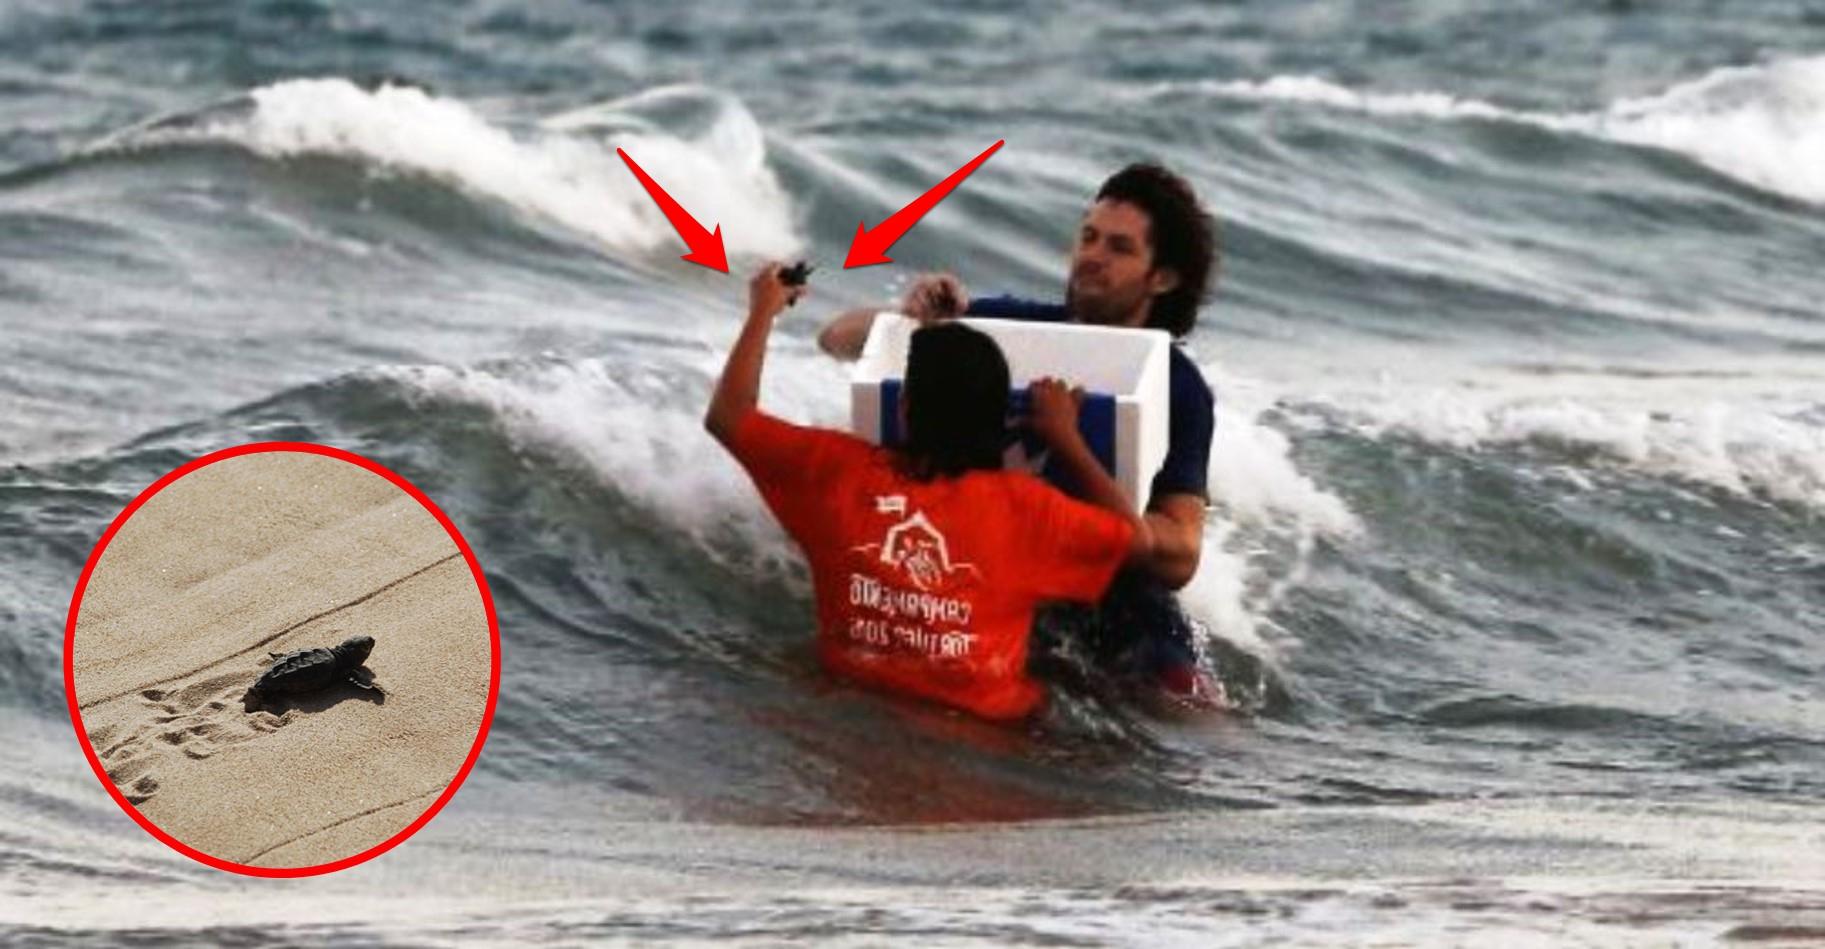 tortugas-recien-nacidas-liberadas-al-mar-valencia